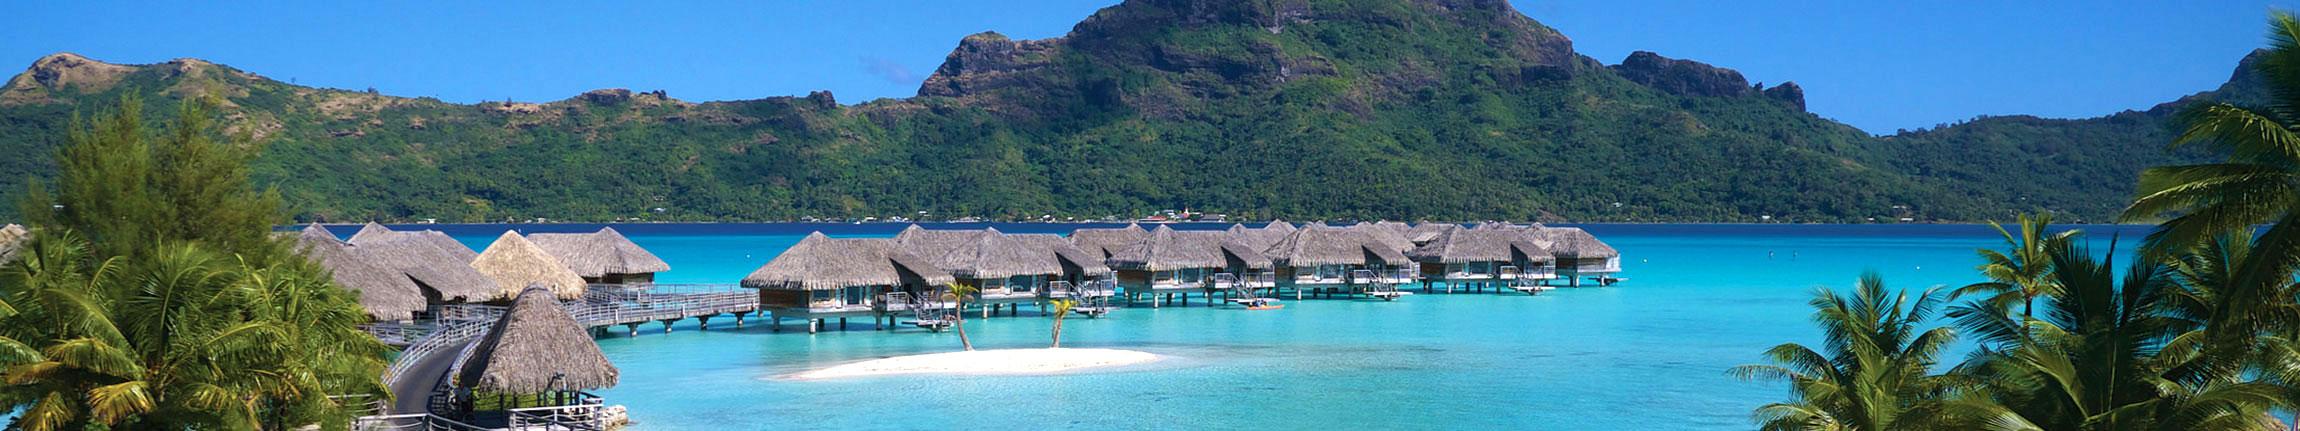 Intercontinental Bora Bora Resort Thalasso Spa E Tahiti Travel